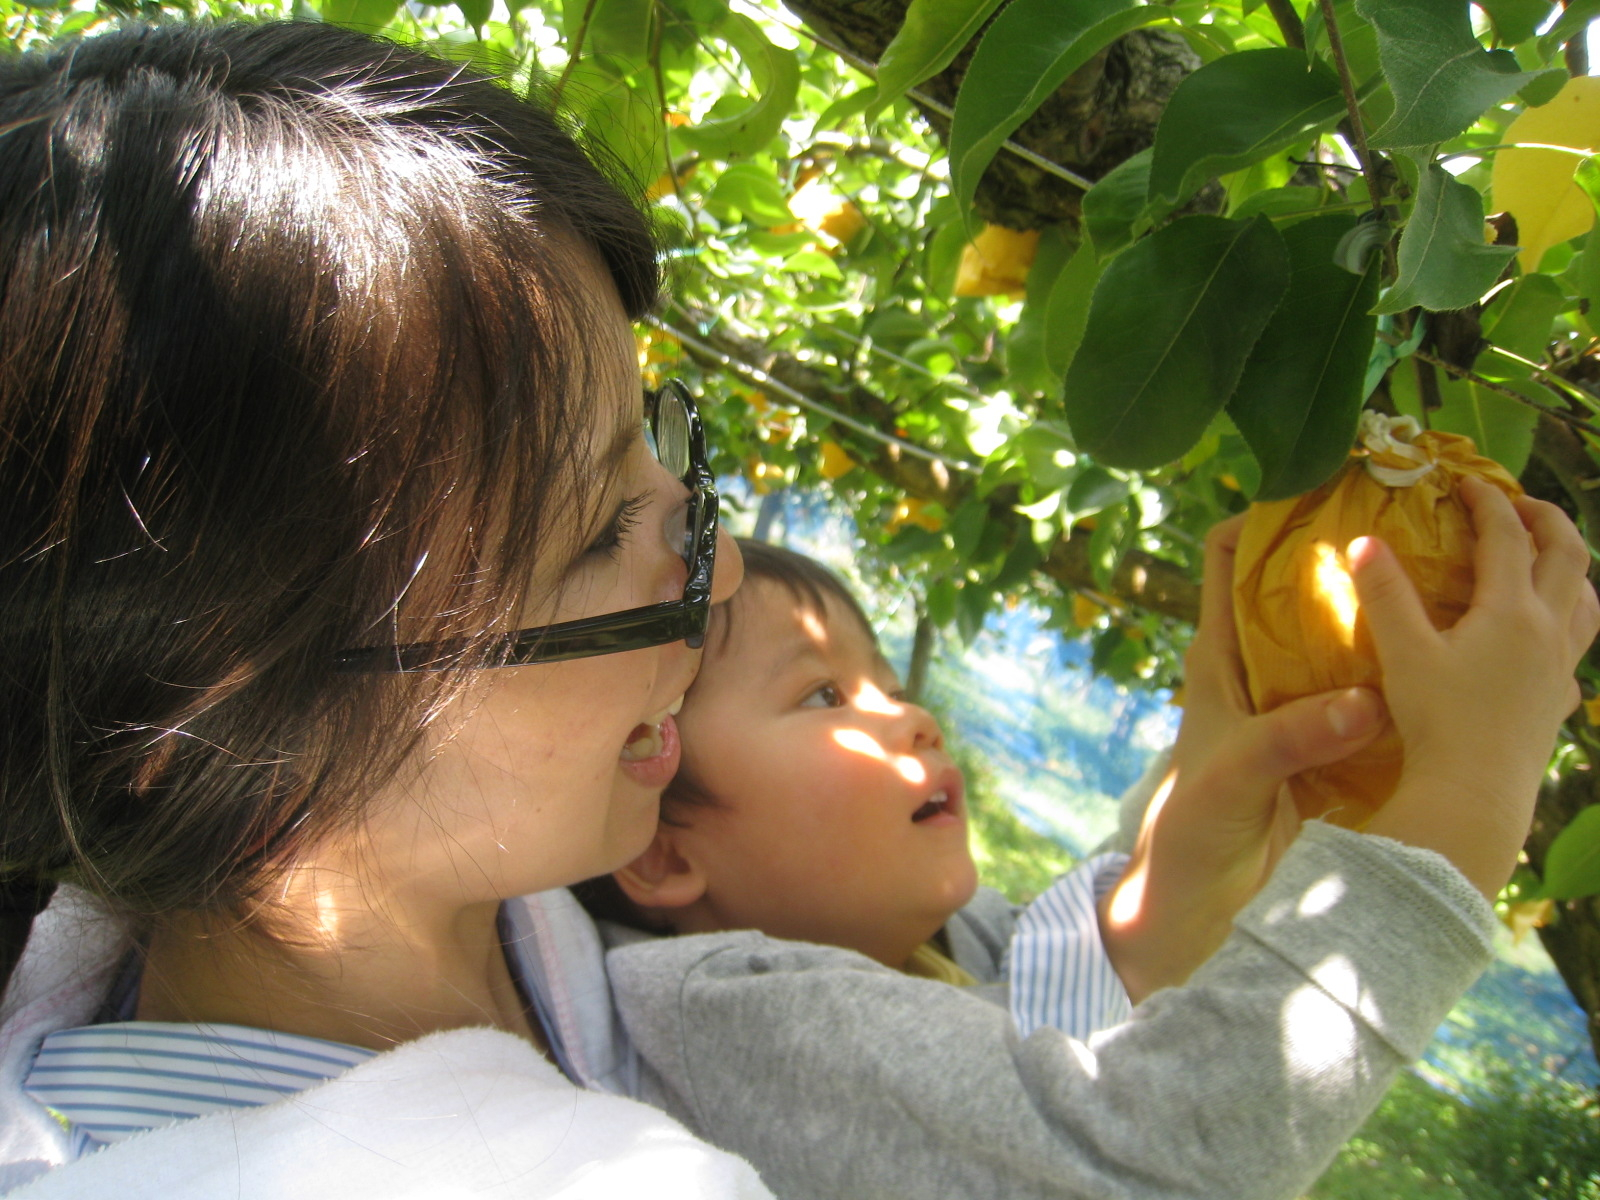 1. Sugane Fruit Land / Pear, Grapes